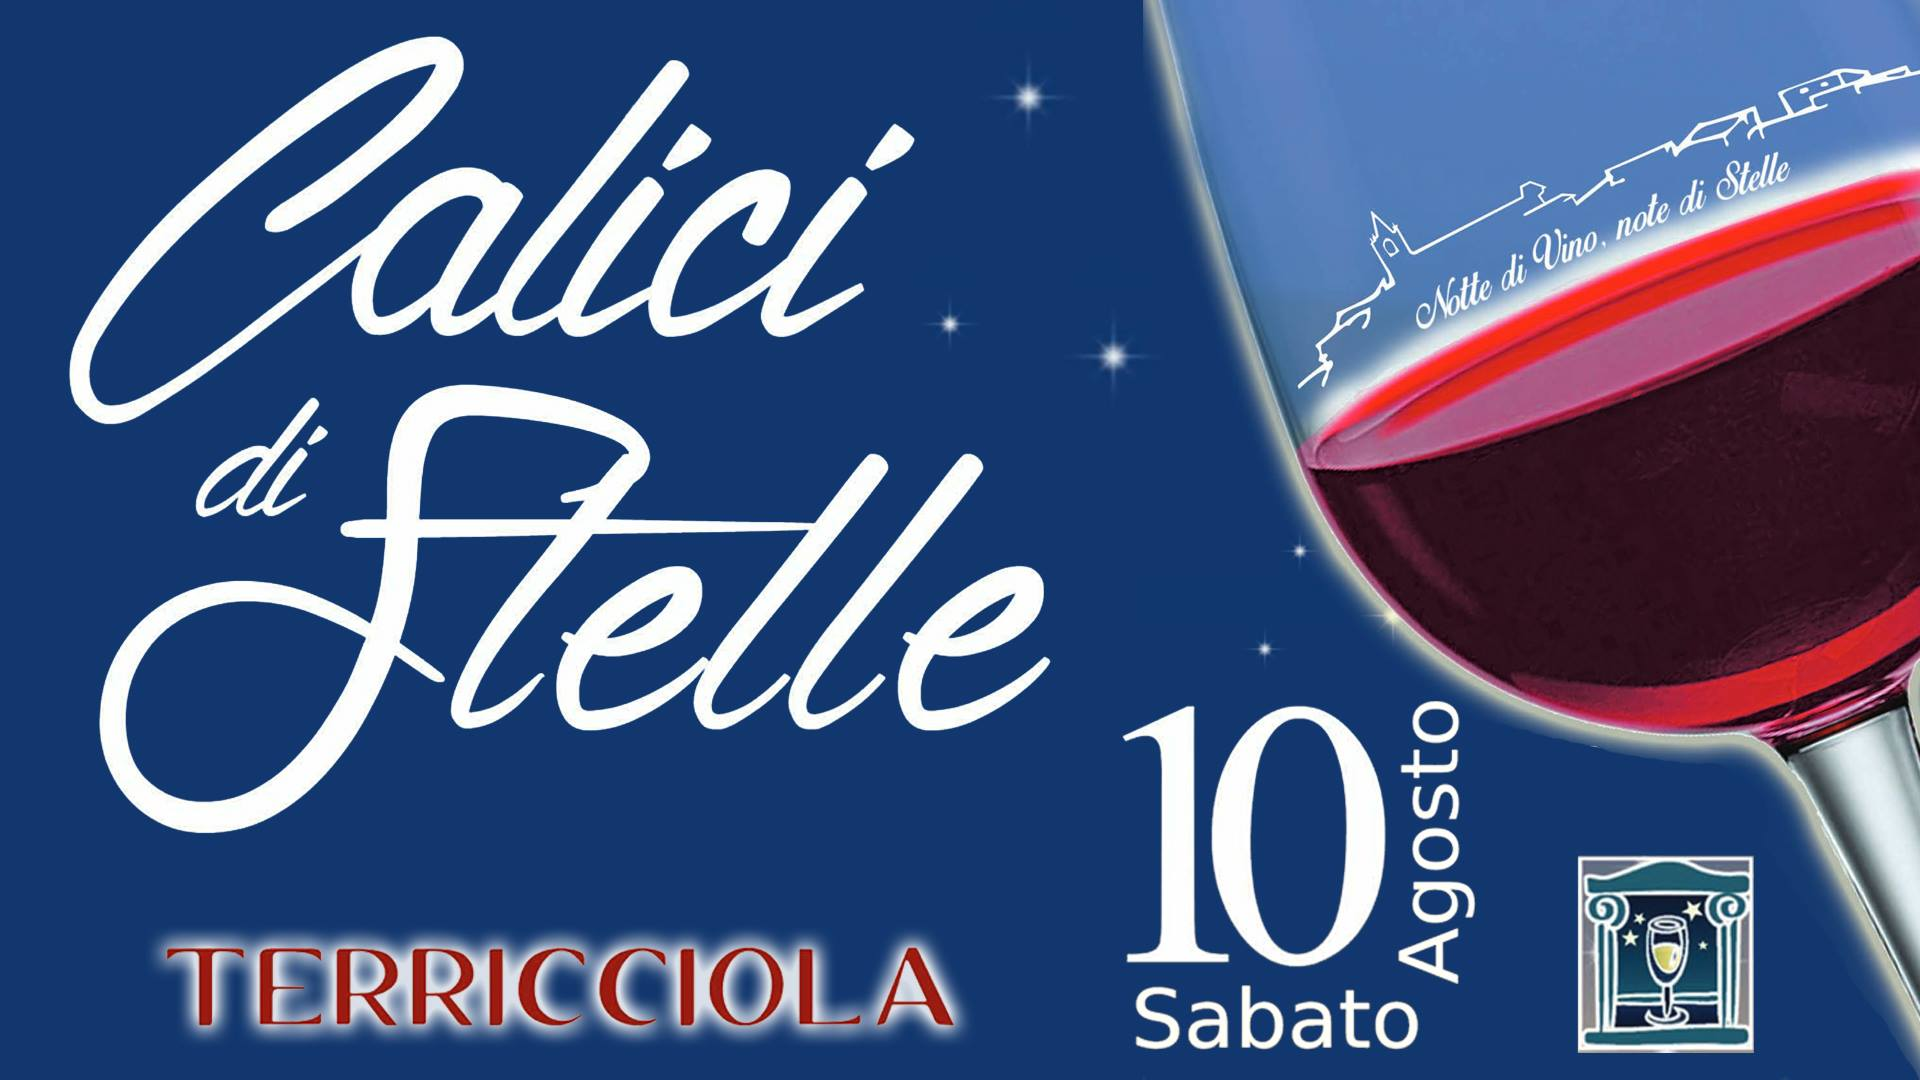 """Calici di Stelle"" – Wine tasting under the stars | Terricciola"